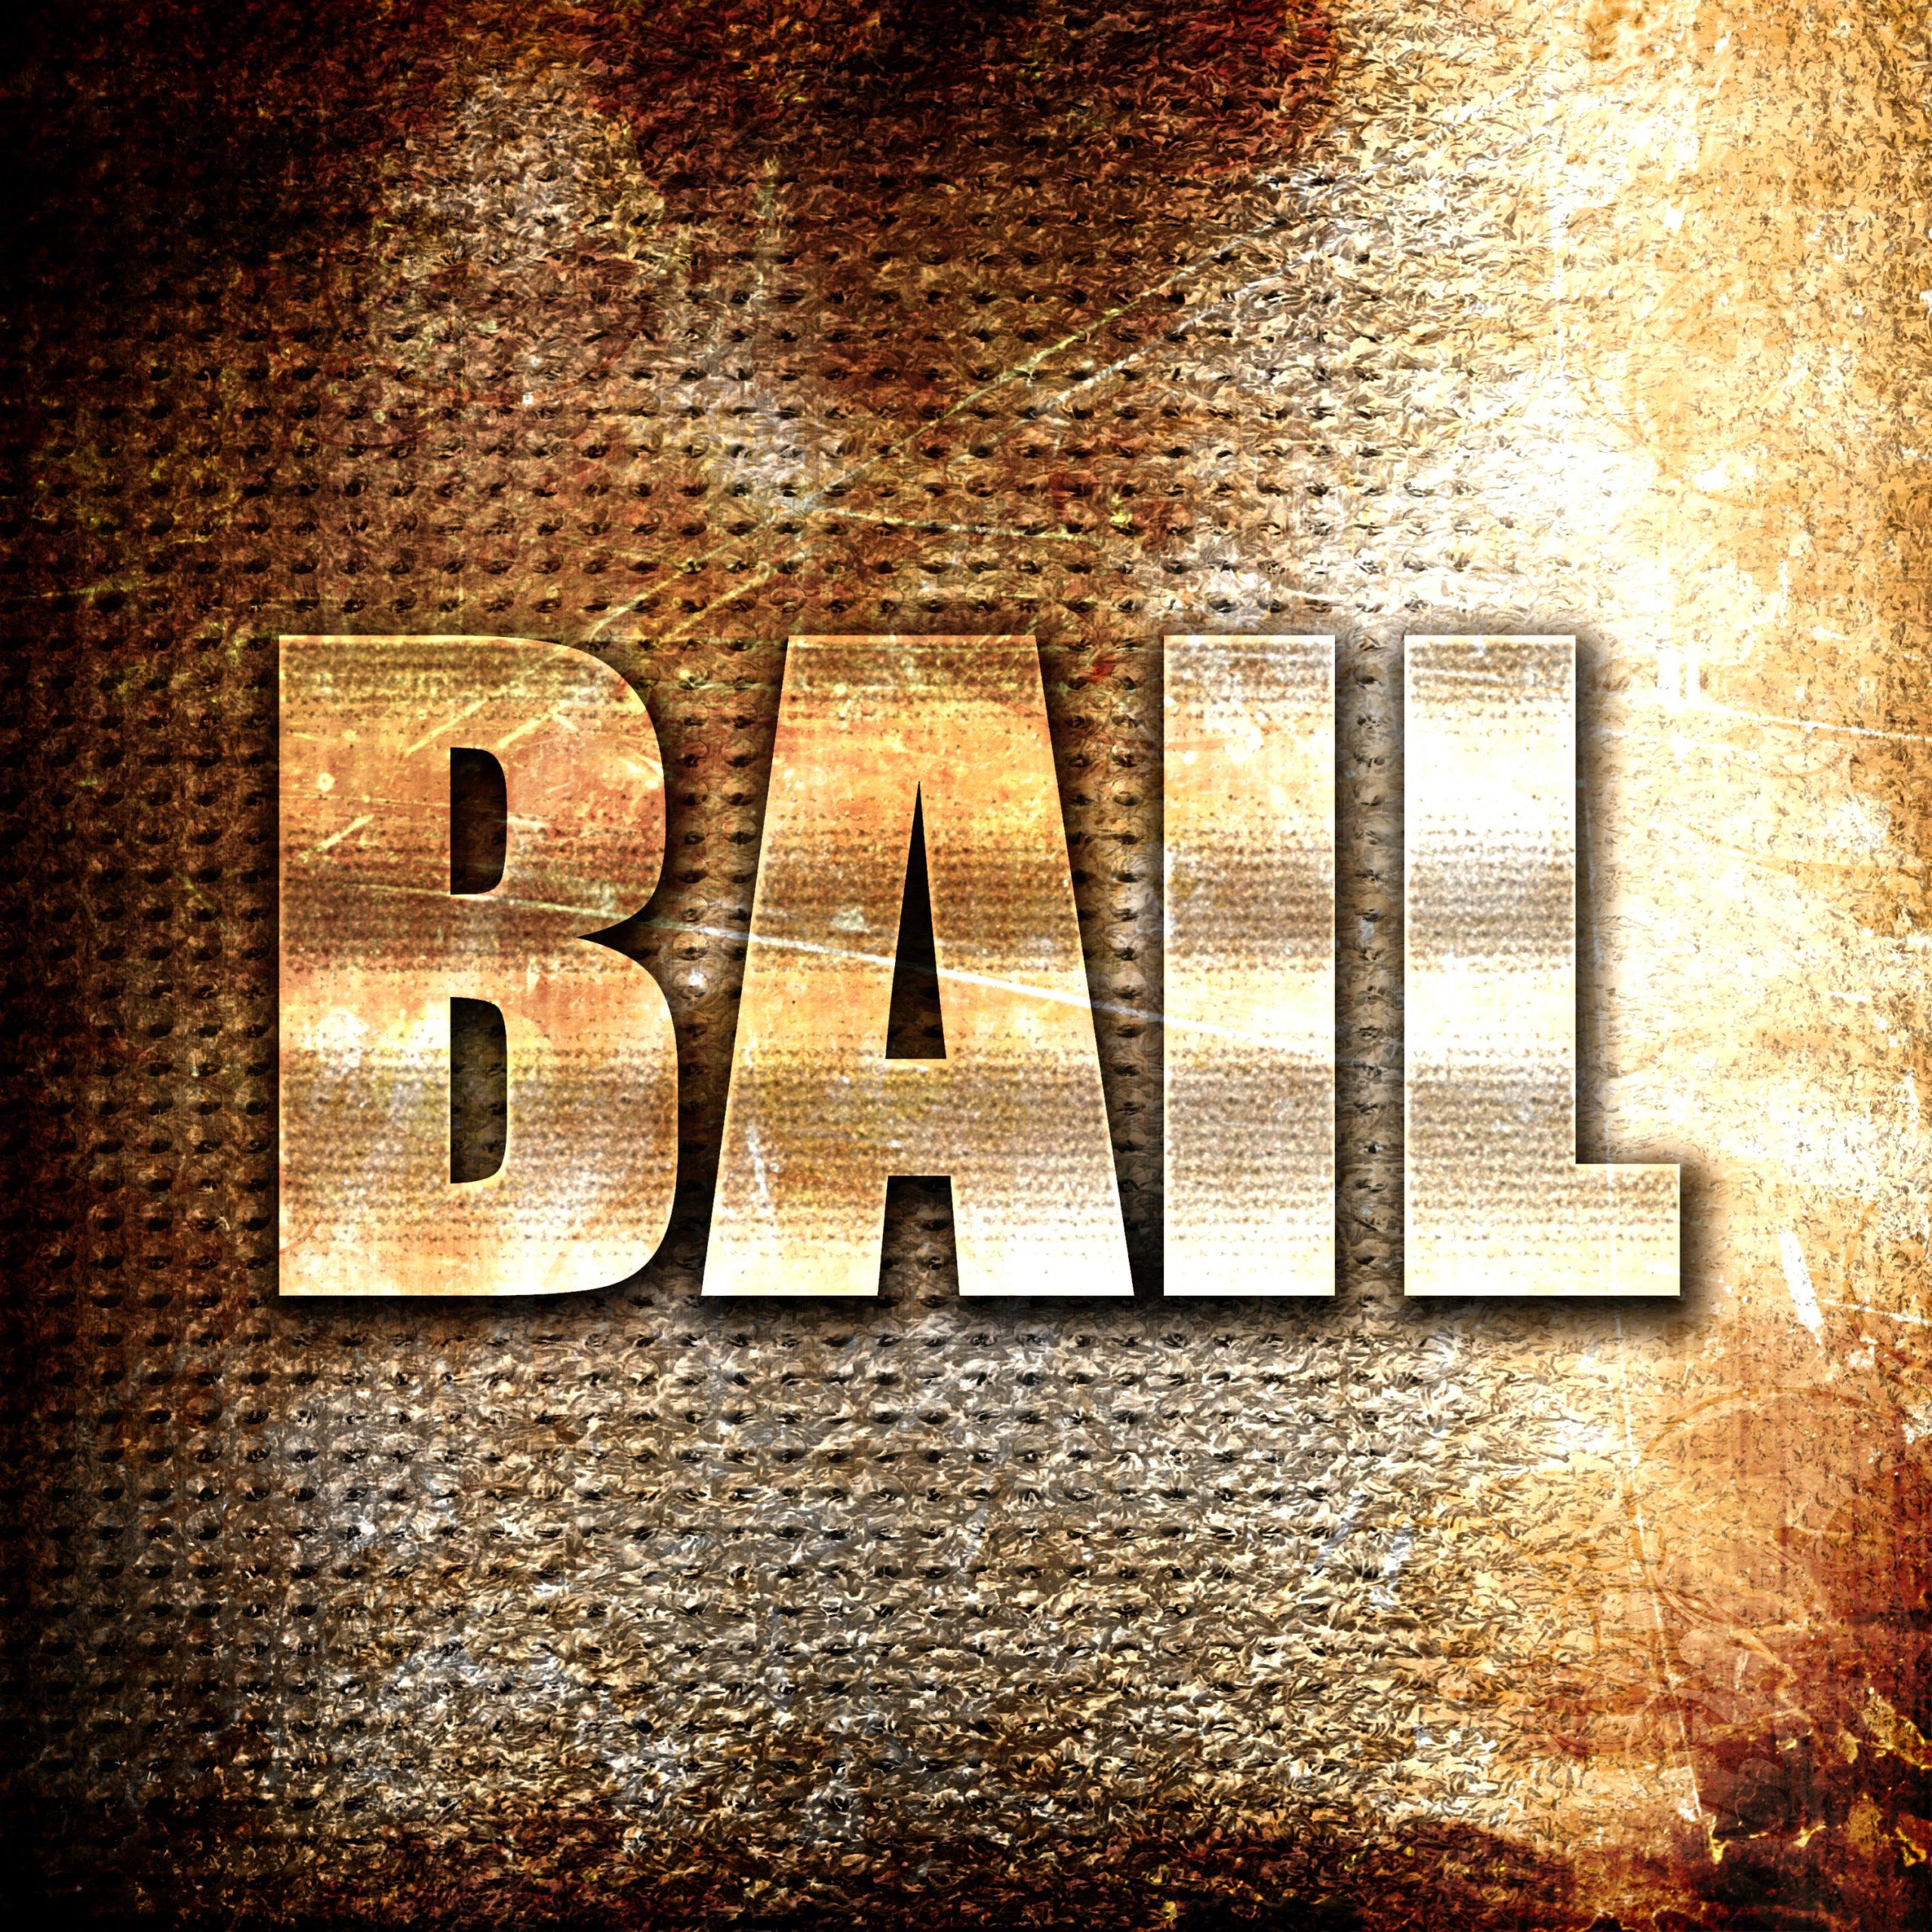 bail, bondsman, crime, arrest, judge, magistrate, surety